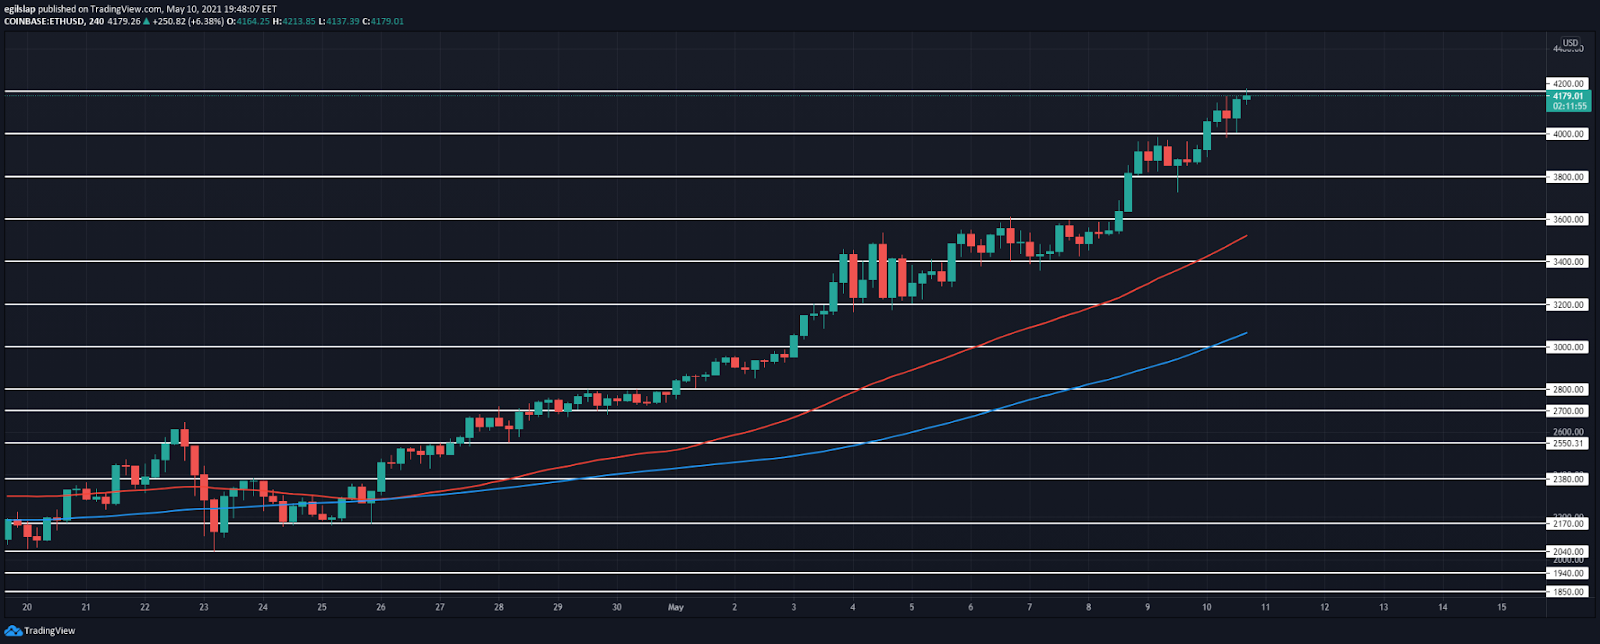 Ethereum price prediction: Ethereum reached $4,200, prepares to retrace? 2